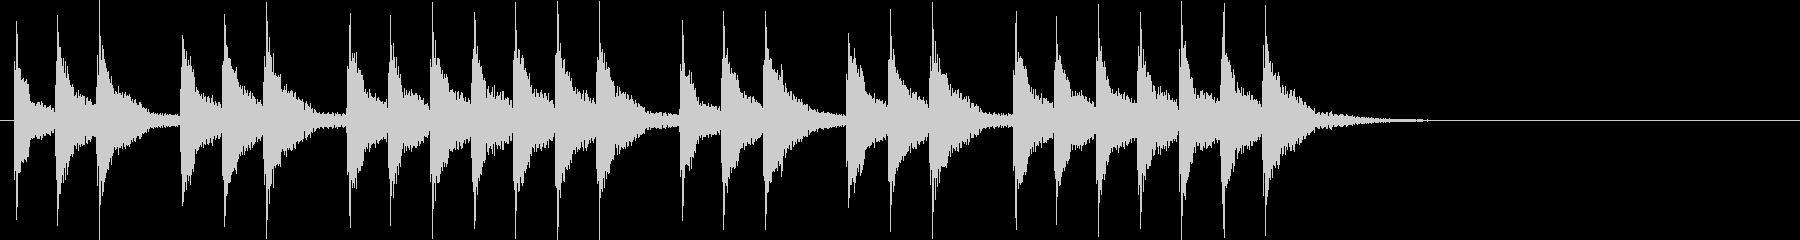 三三七拍子×2(遅)太鼓+手拍子+笛の未再生の波形